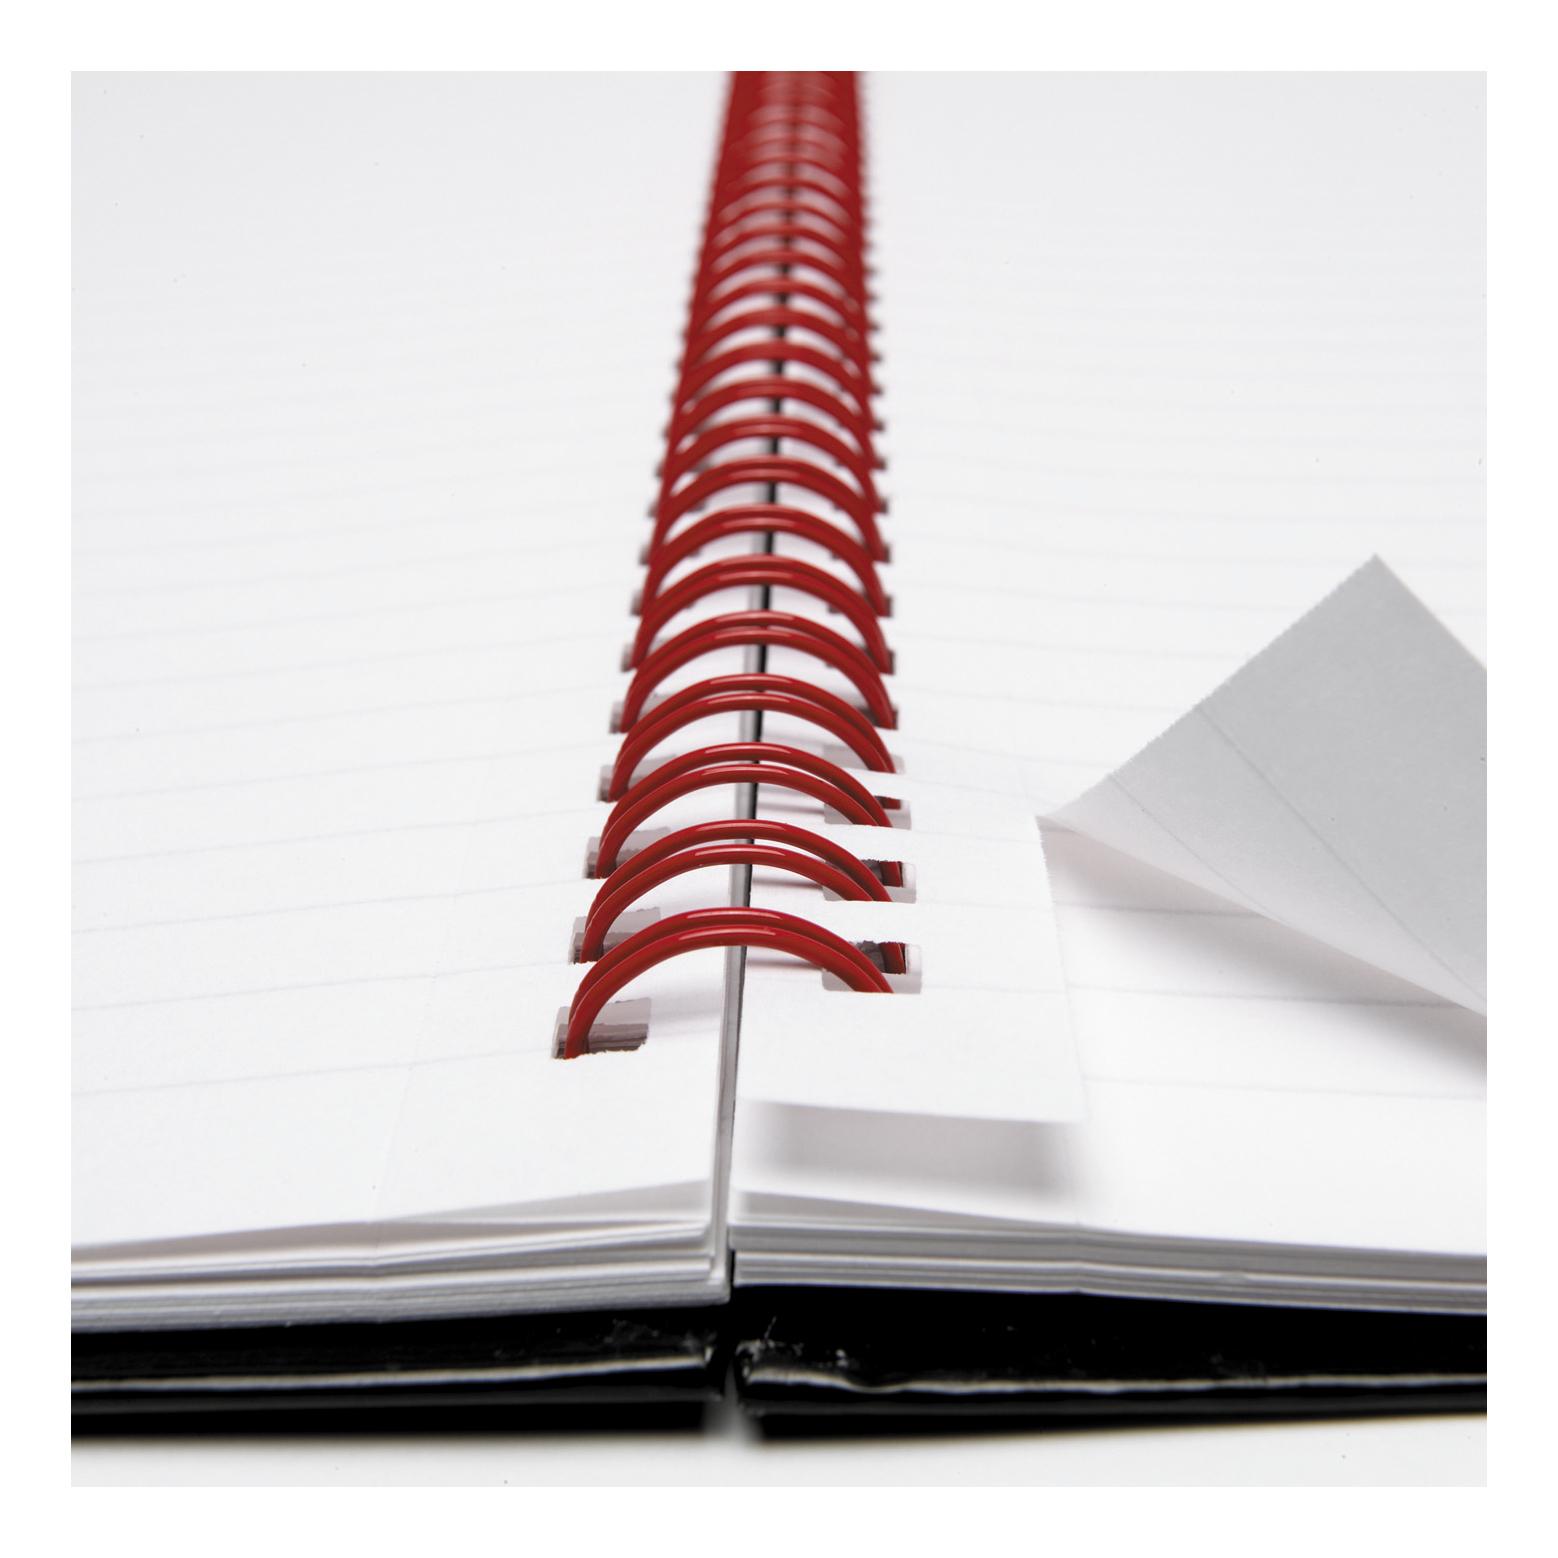 Black N Red Nbk Wbnd Perfd A4 Ref 100102248 Pk 5 [Buy 2 & Free Pk 12 BIC Pro Ball Pen 4 Cols] Jan-Mar 20